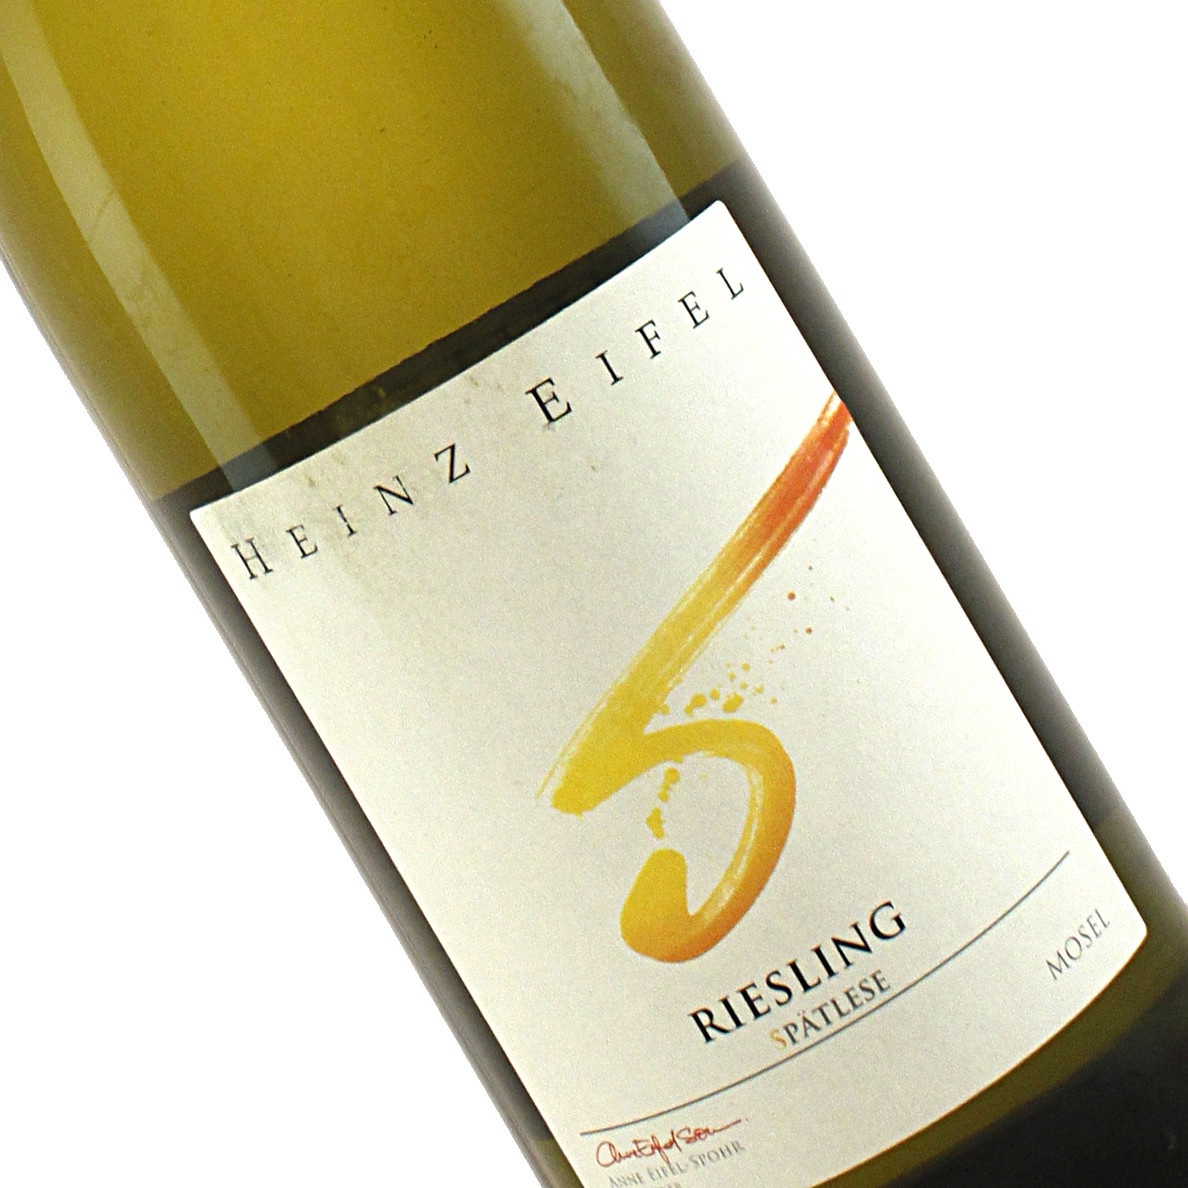 Heinz Eifel 2018 Riesling Spatlese, Mosel